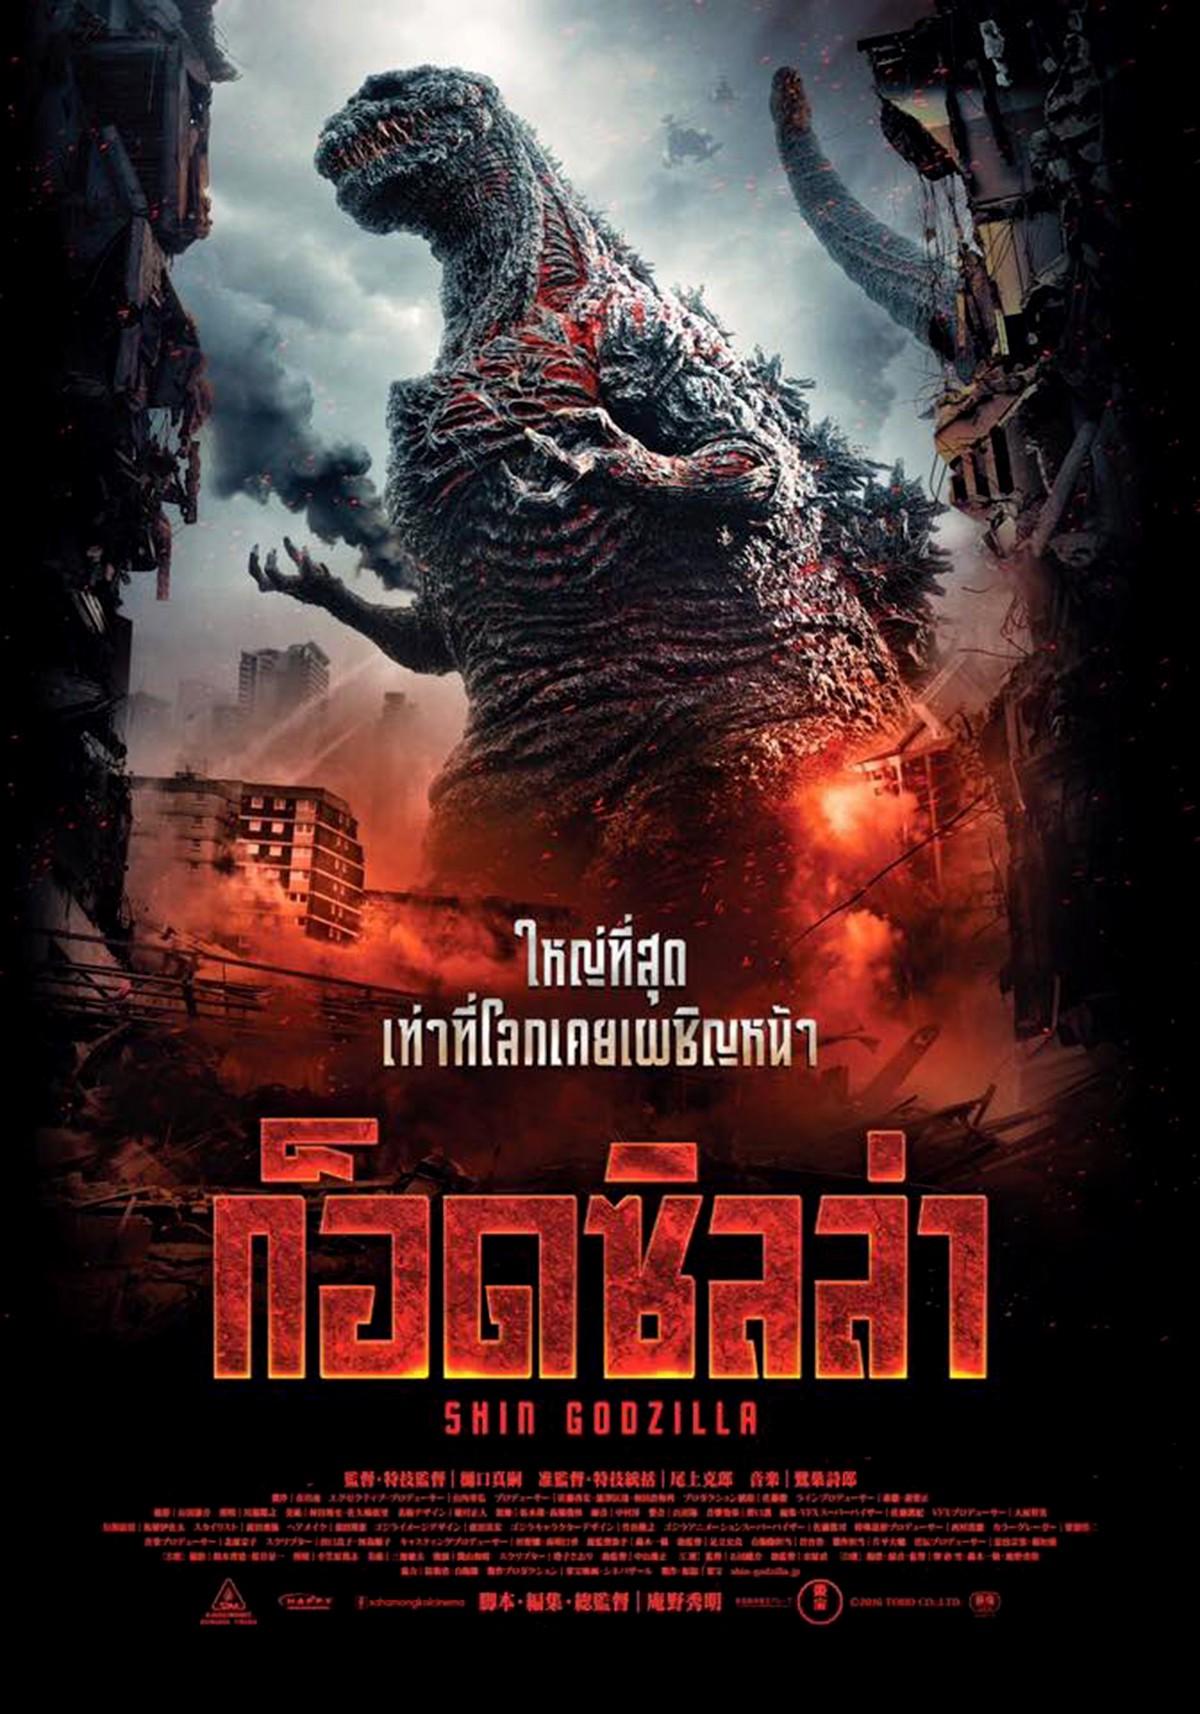 shin-godzilla-original-thai-movie-poster-ds-2016.jpg